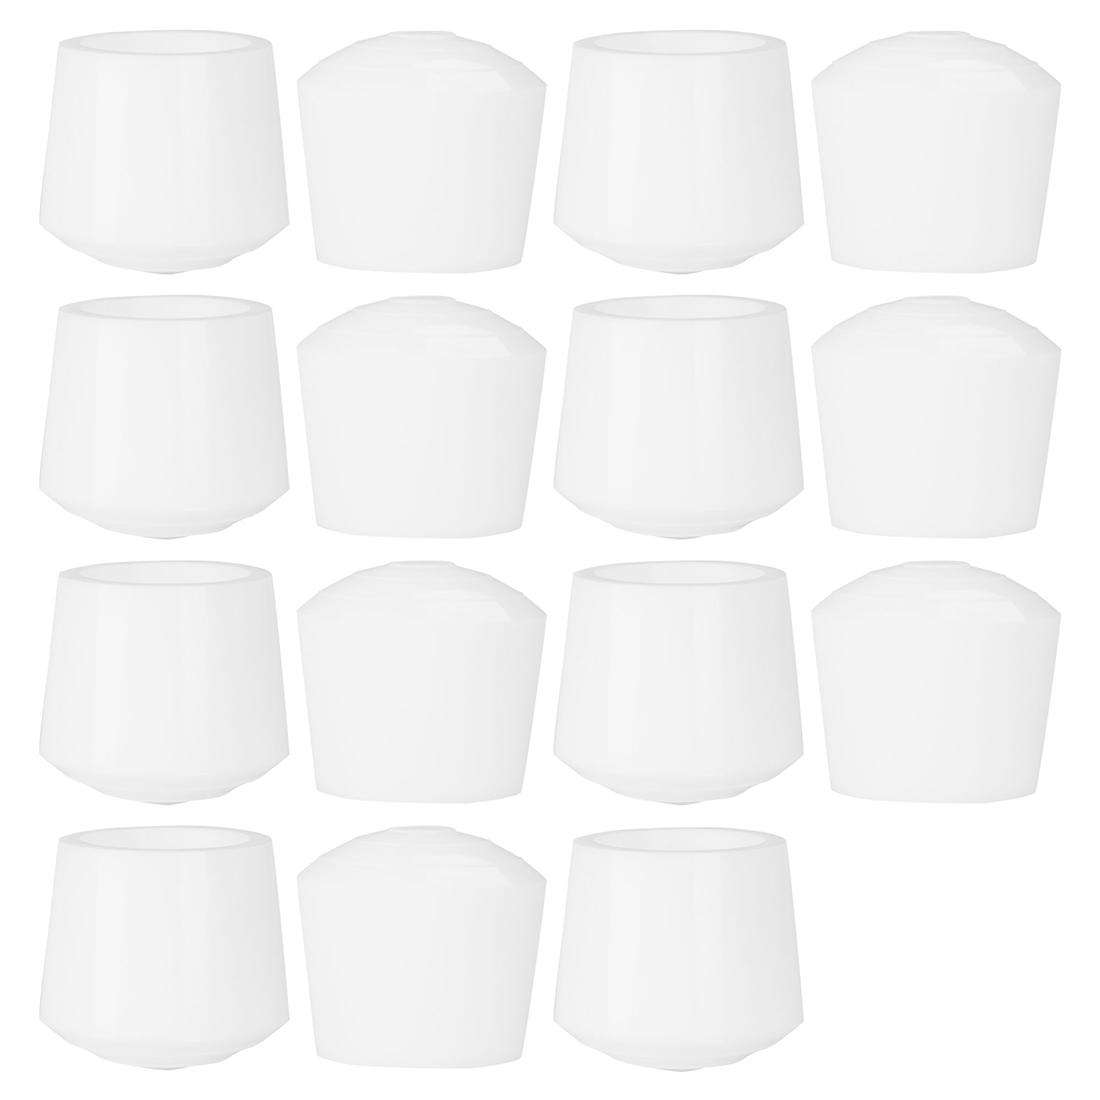 "Rubber Leg Cap Tip Cup Feet Cover 35mm 1 3/8"" Inner Dia 15pcs for Furniture Desk"